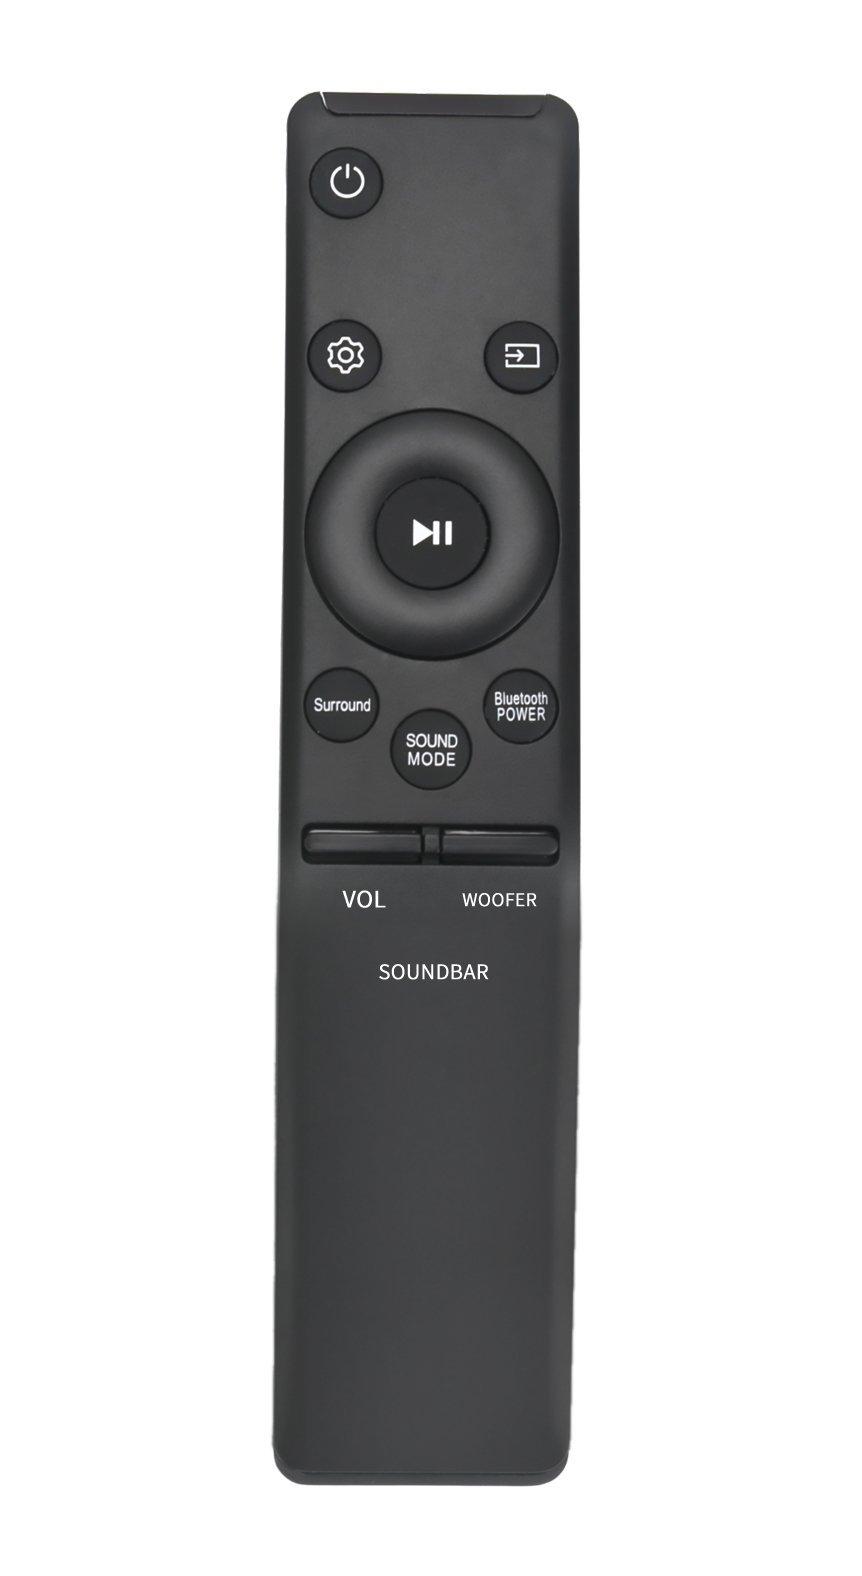 AH59-02758A Replace Remote Fit For Samsung Soundbar HW-M450 HW-M4500 HW-M4501